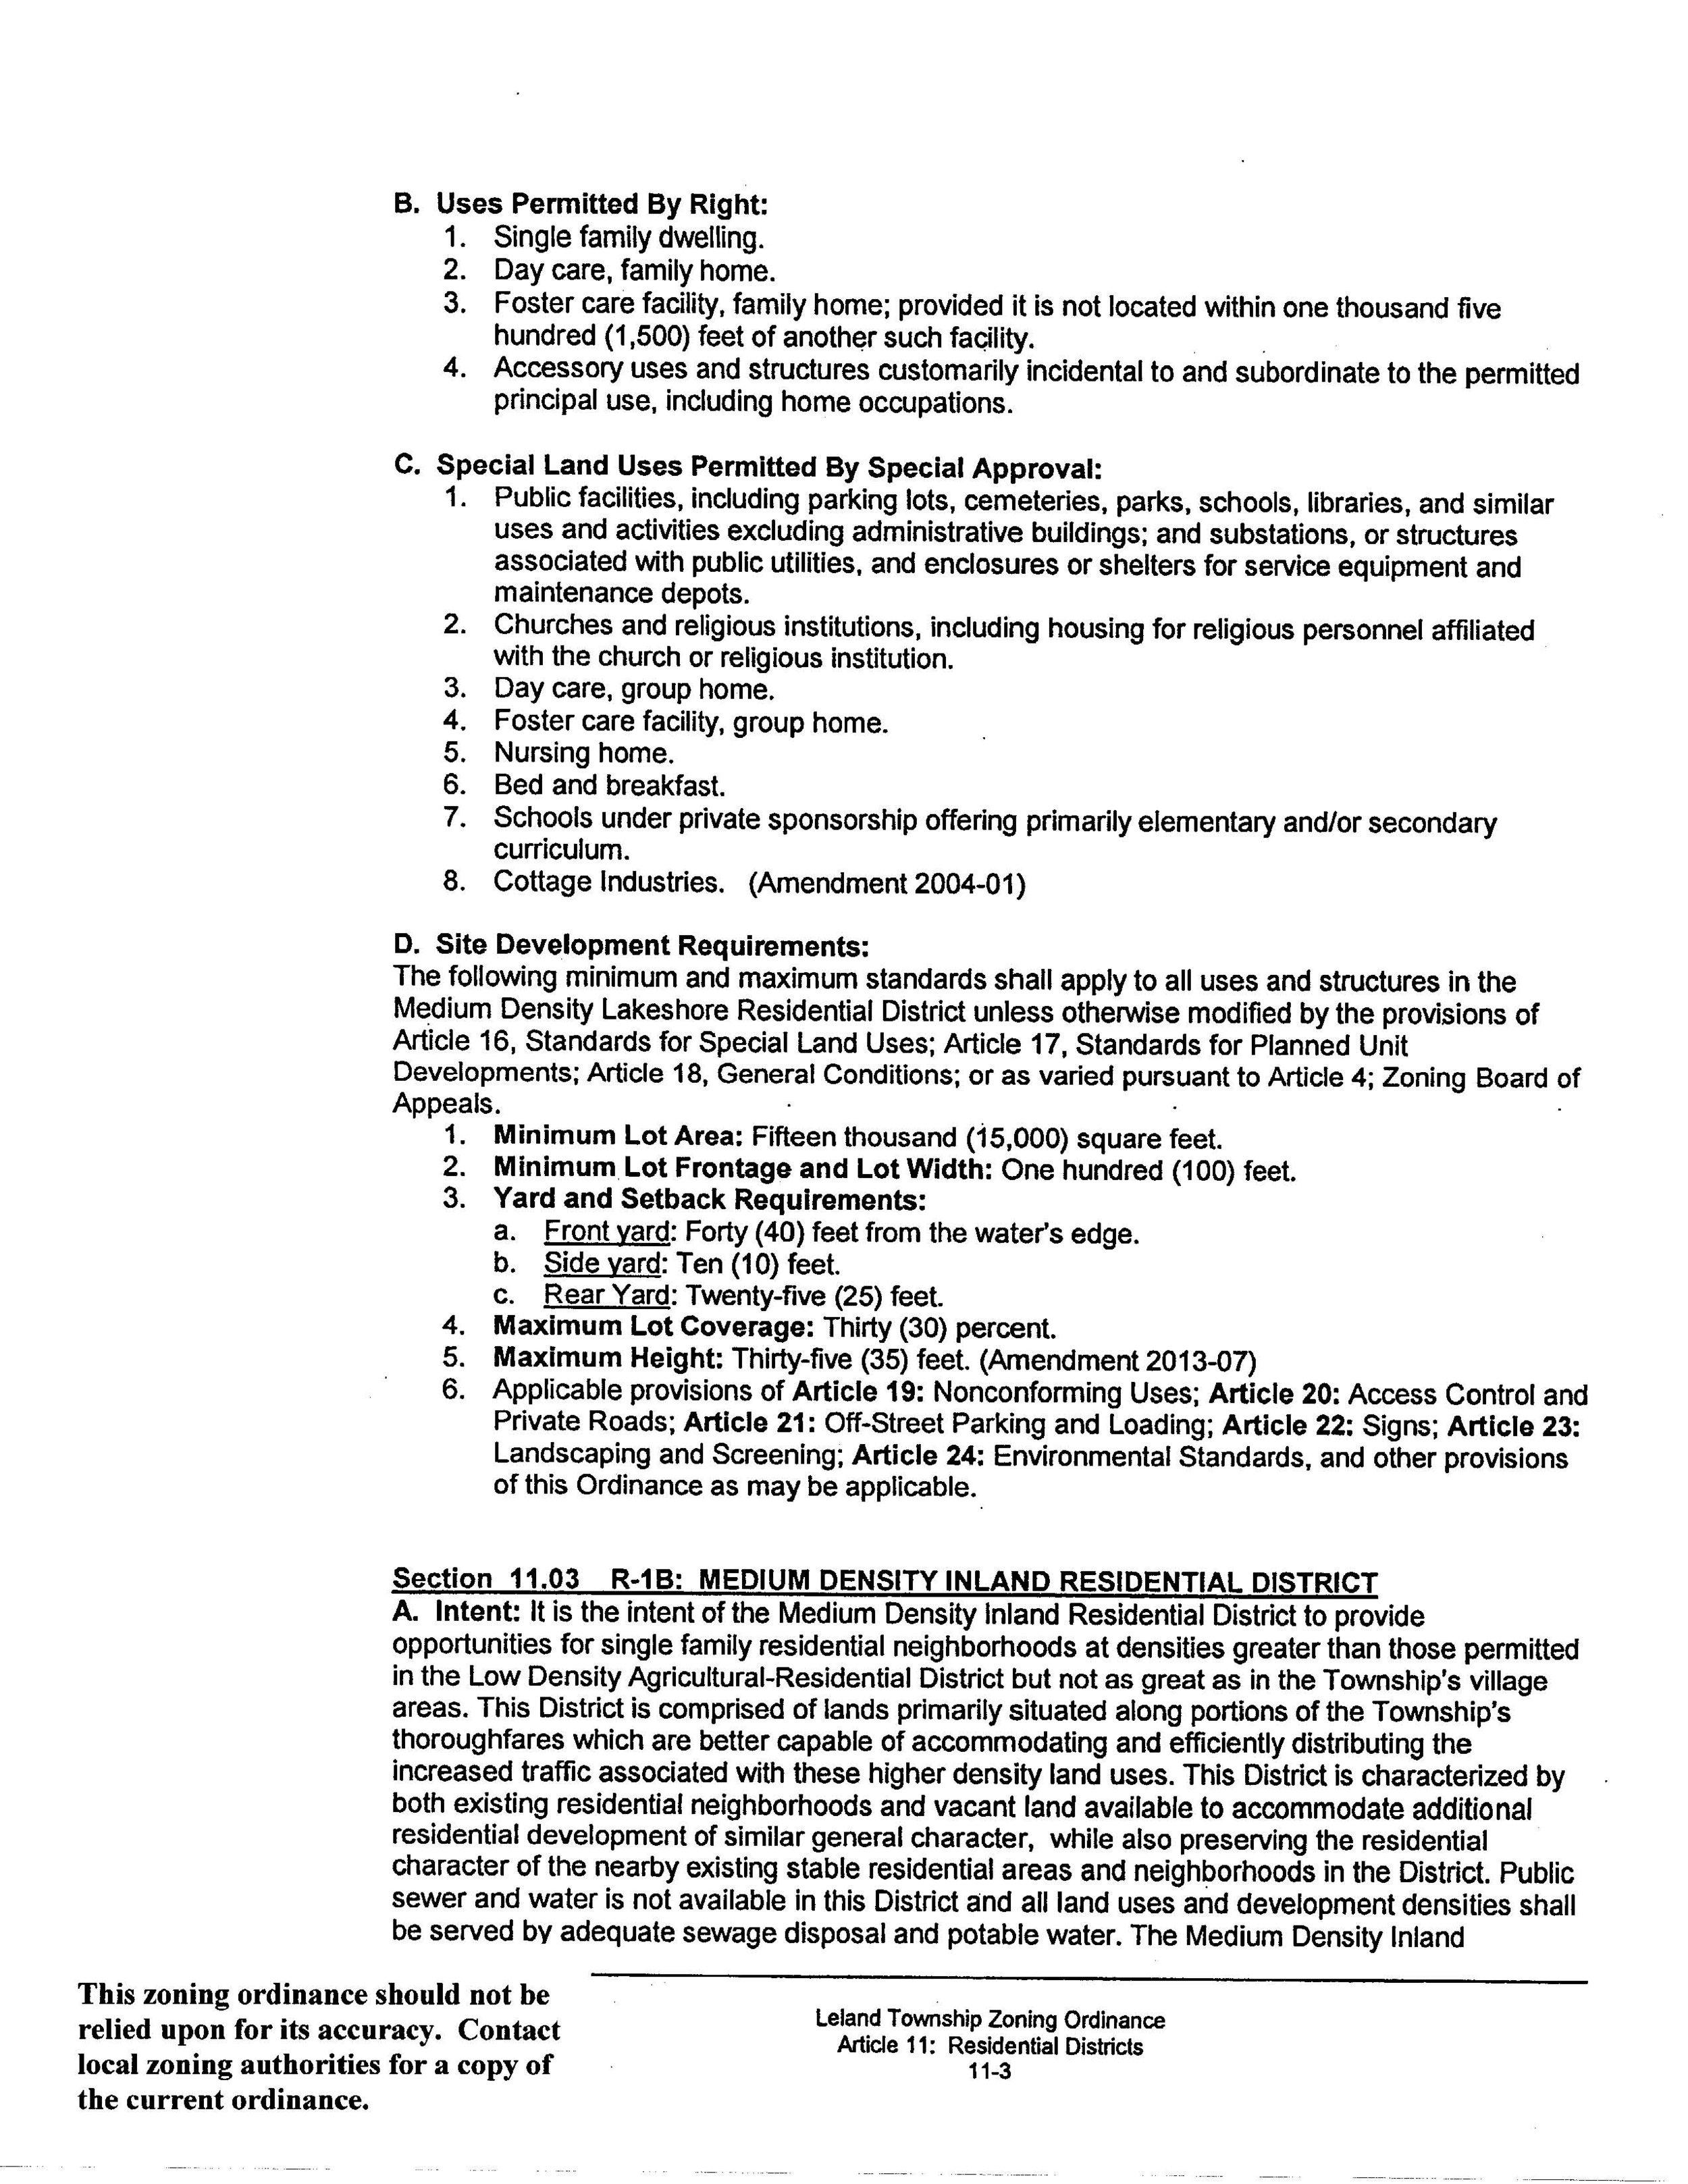 4388 N Manitou Trail, Leland - Marketing packet by Oltersdorf Realty LLC (39).jpg